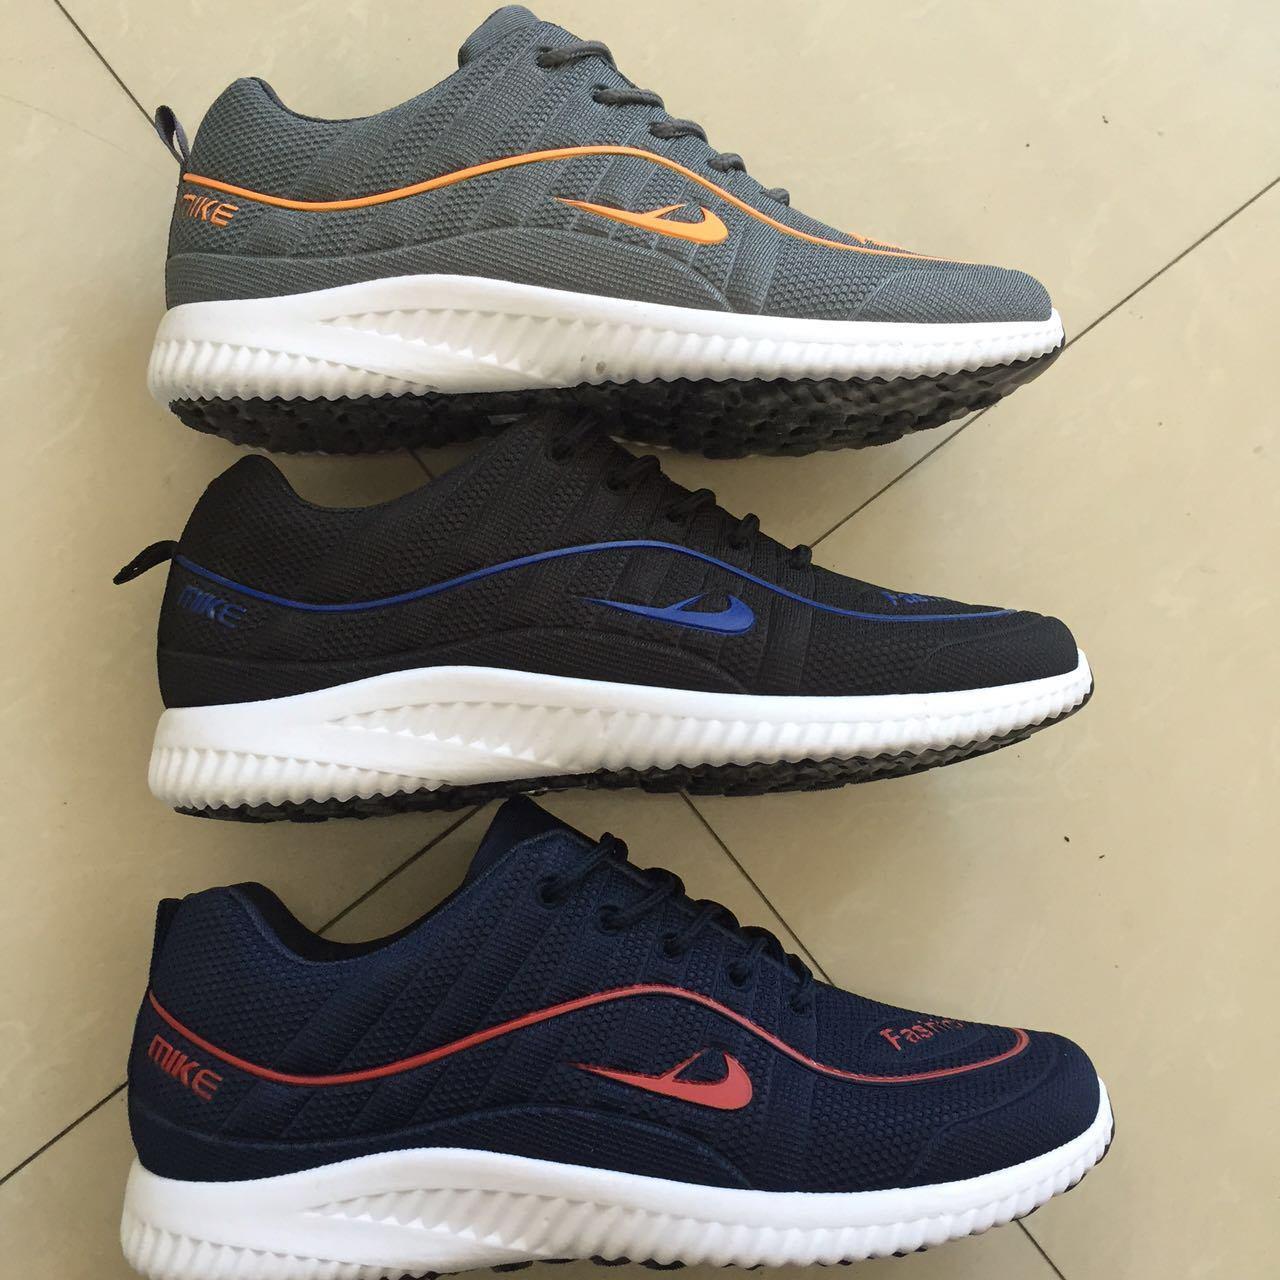 Athletic Men Comfort Walking Footwear Cheap Sports Shoes